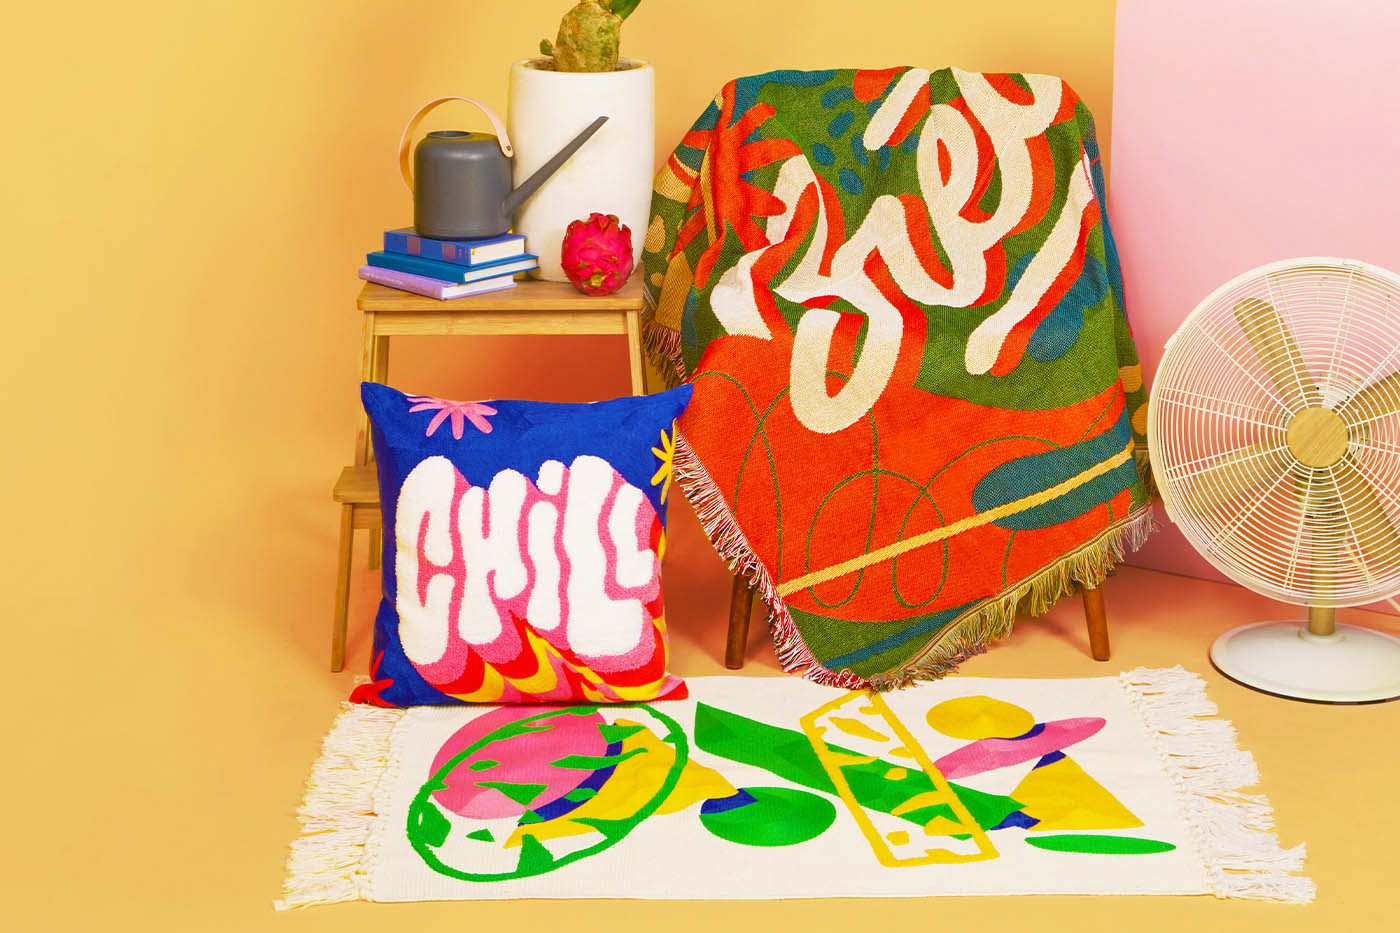 custom merchandise HAND LETTERING home decor home design home pieces lettering Merchandise Design product design